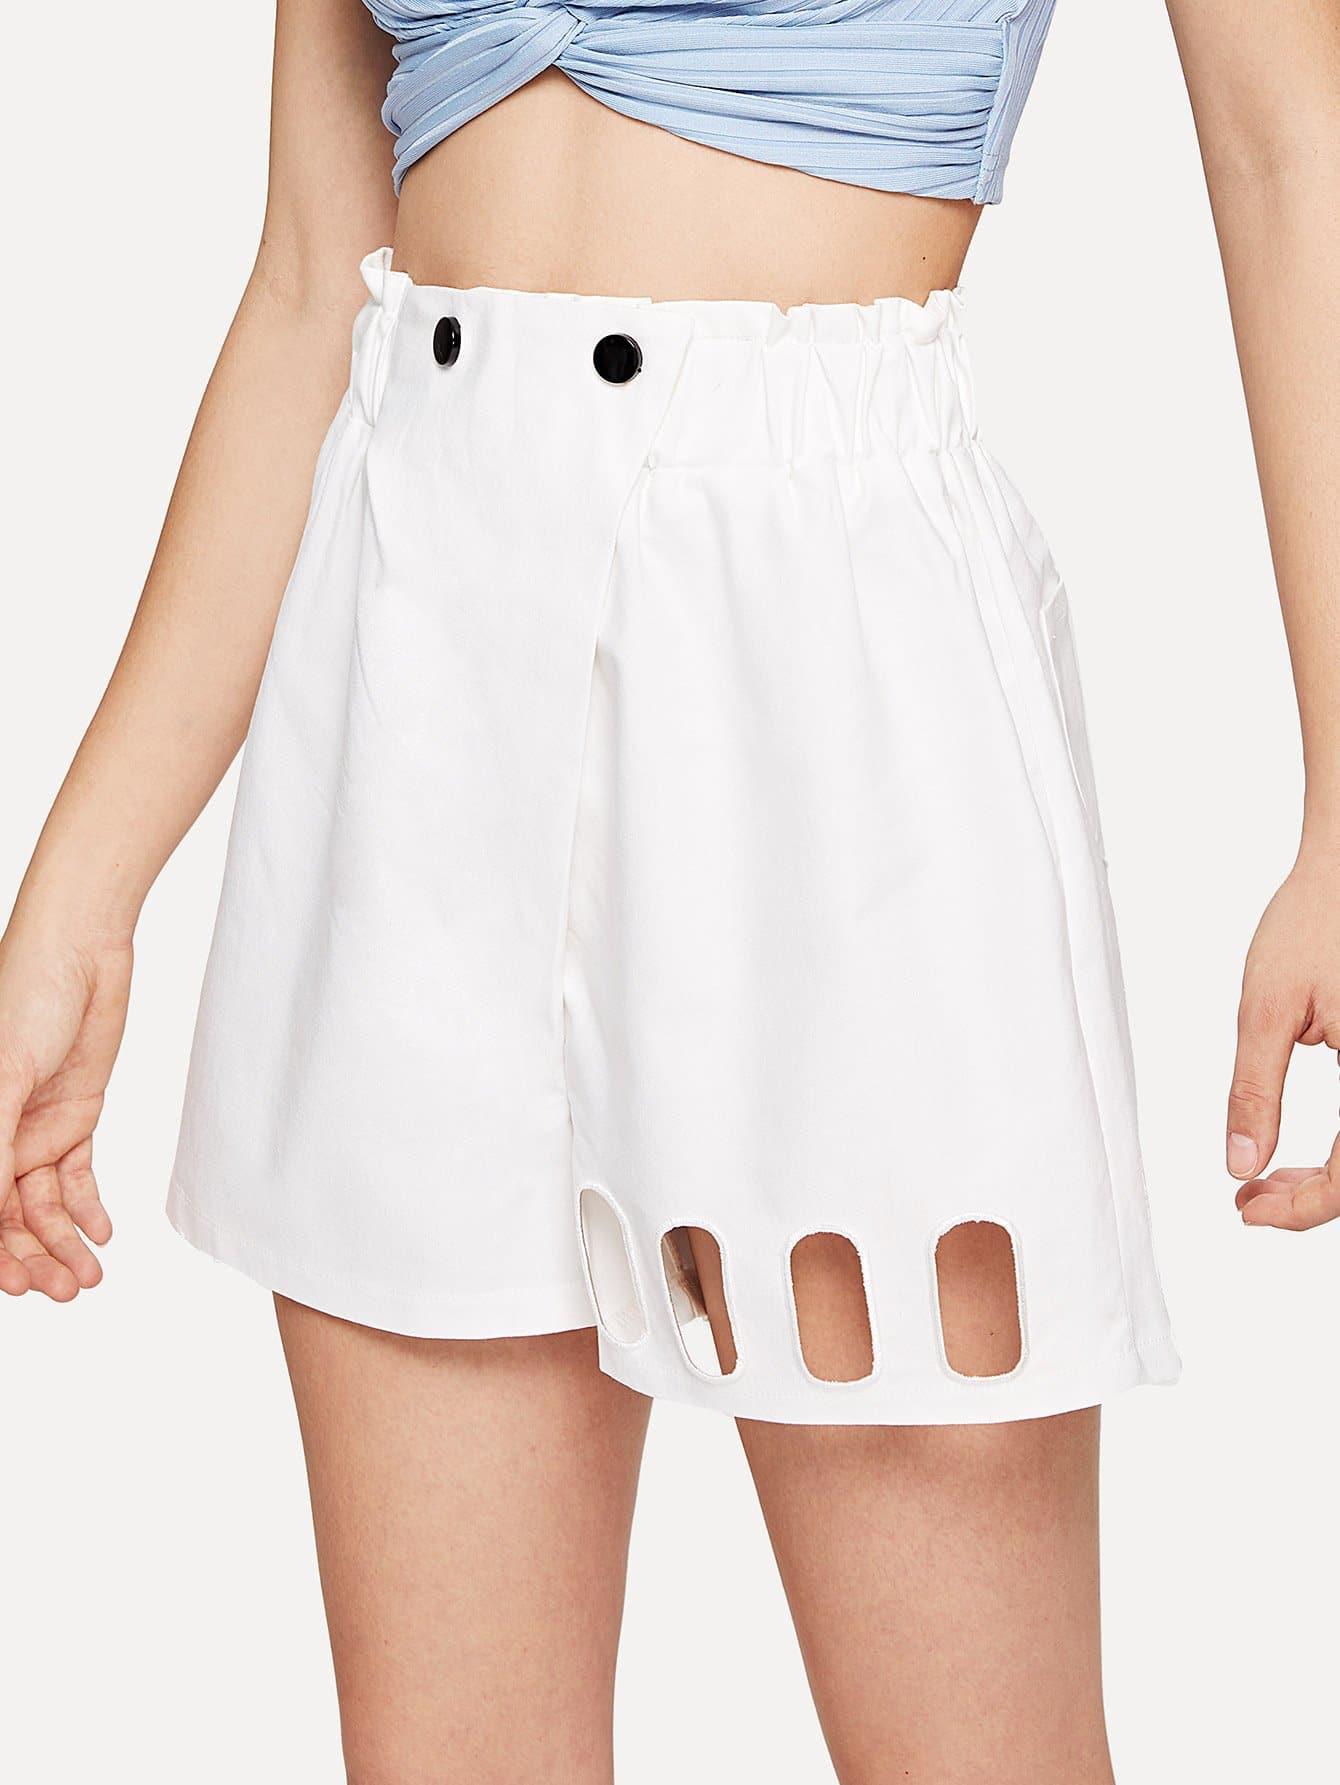 Cutout Hem Elastic Waist Shorts elastic waist geo embroidered scallop hem shorts